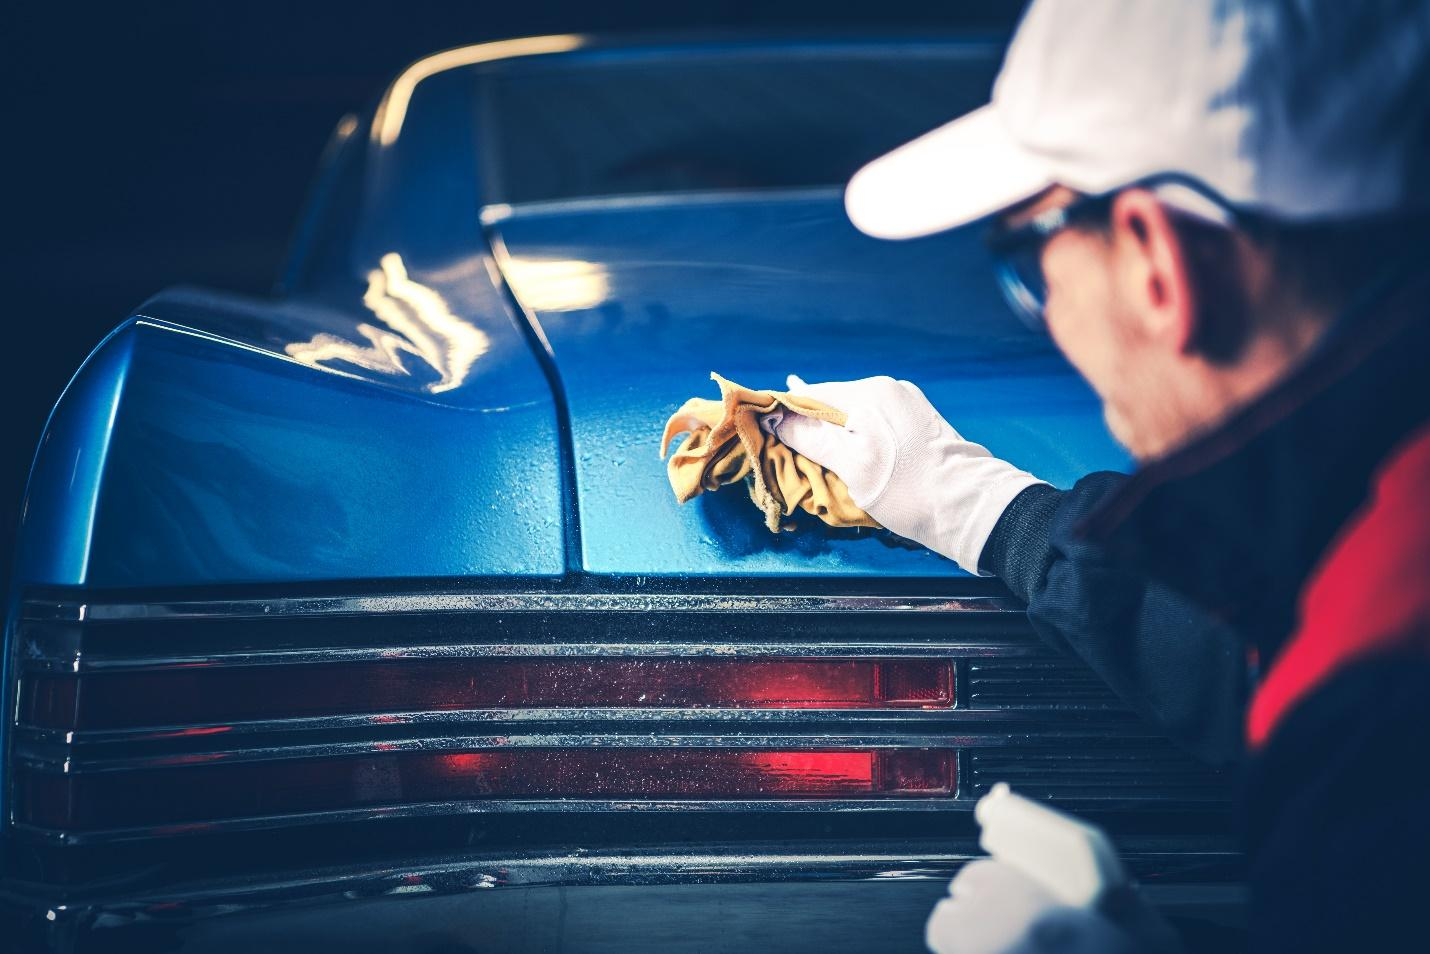 A man doing a DIY ceramic coating on a classic car.